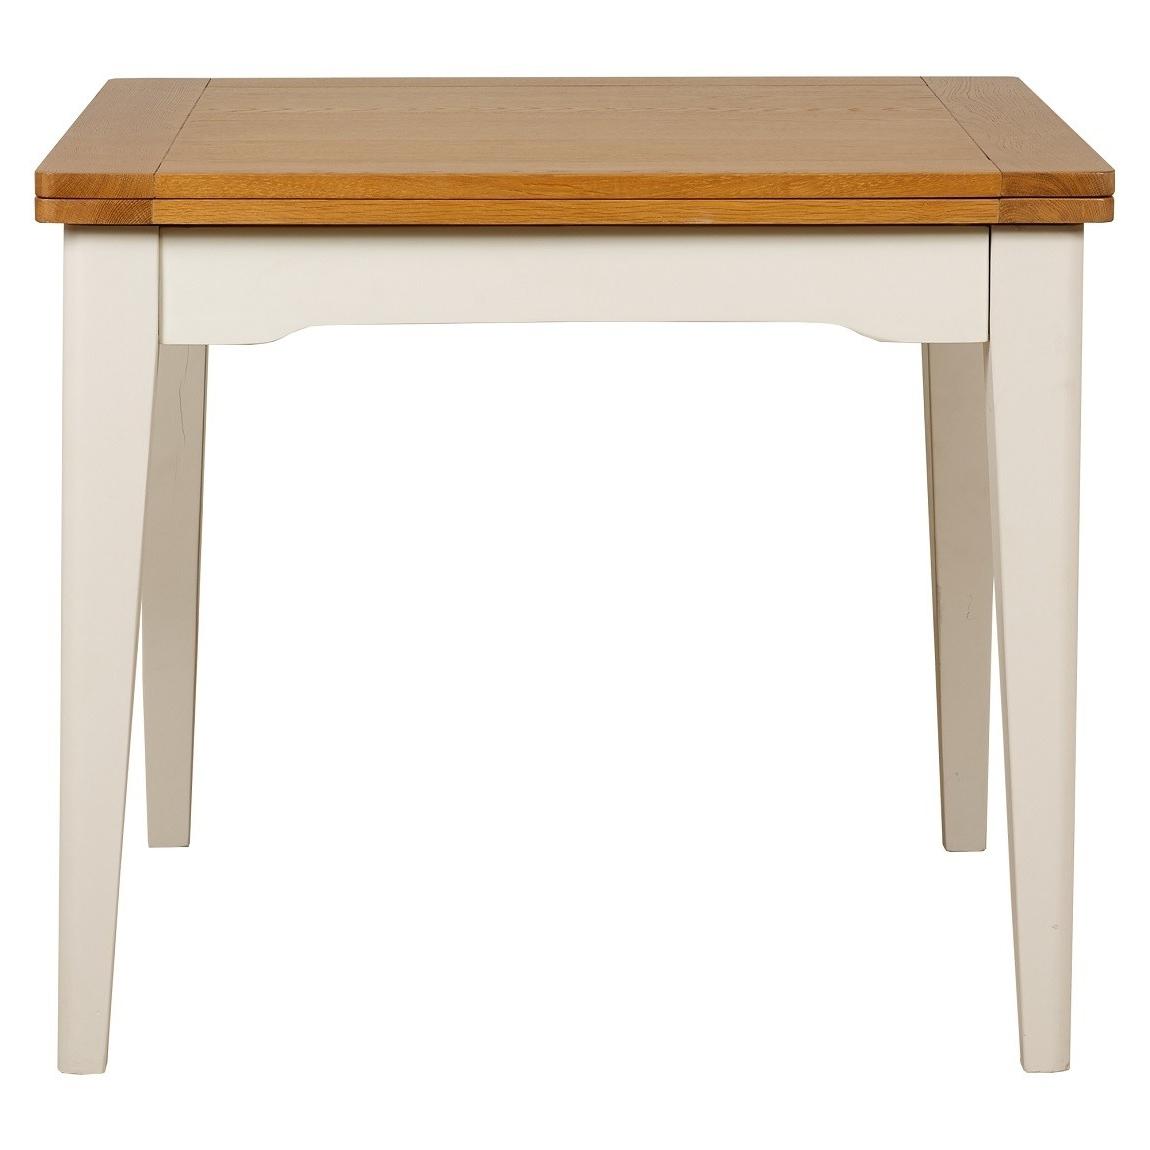 Flip Top Oak Dining Tables For Latest Cottage Oak And Painted Flip Top Dining Table (View 5 of 25)